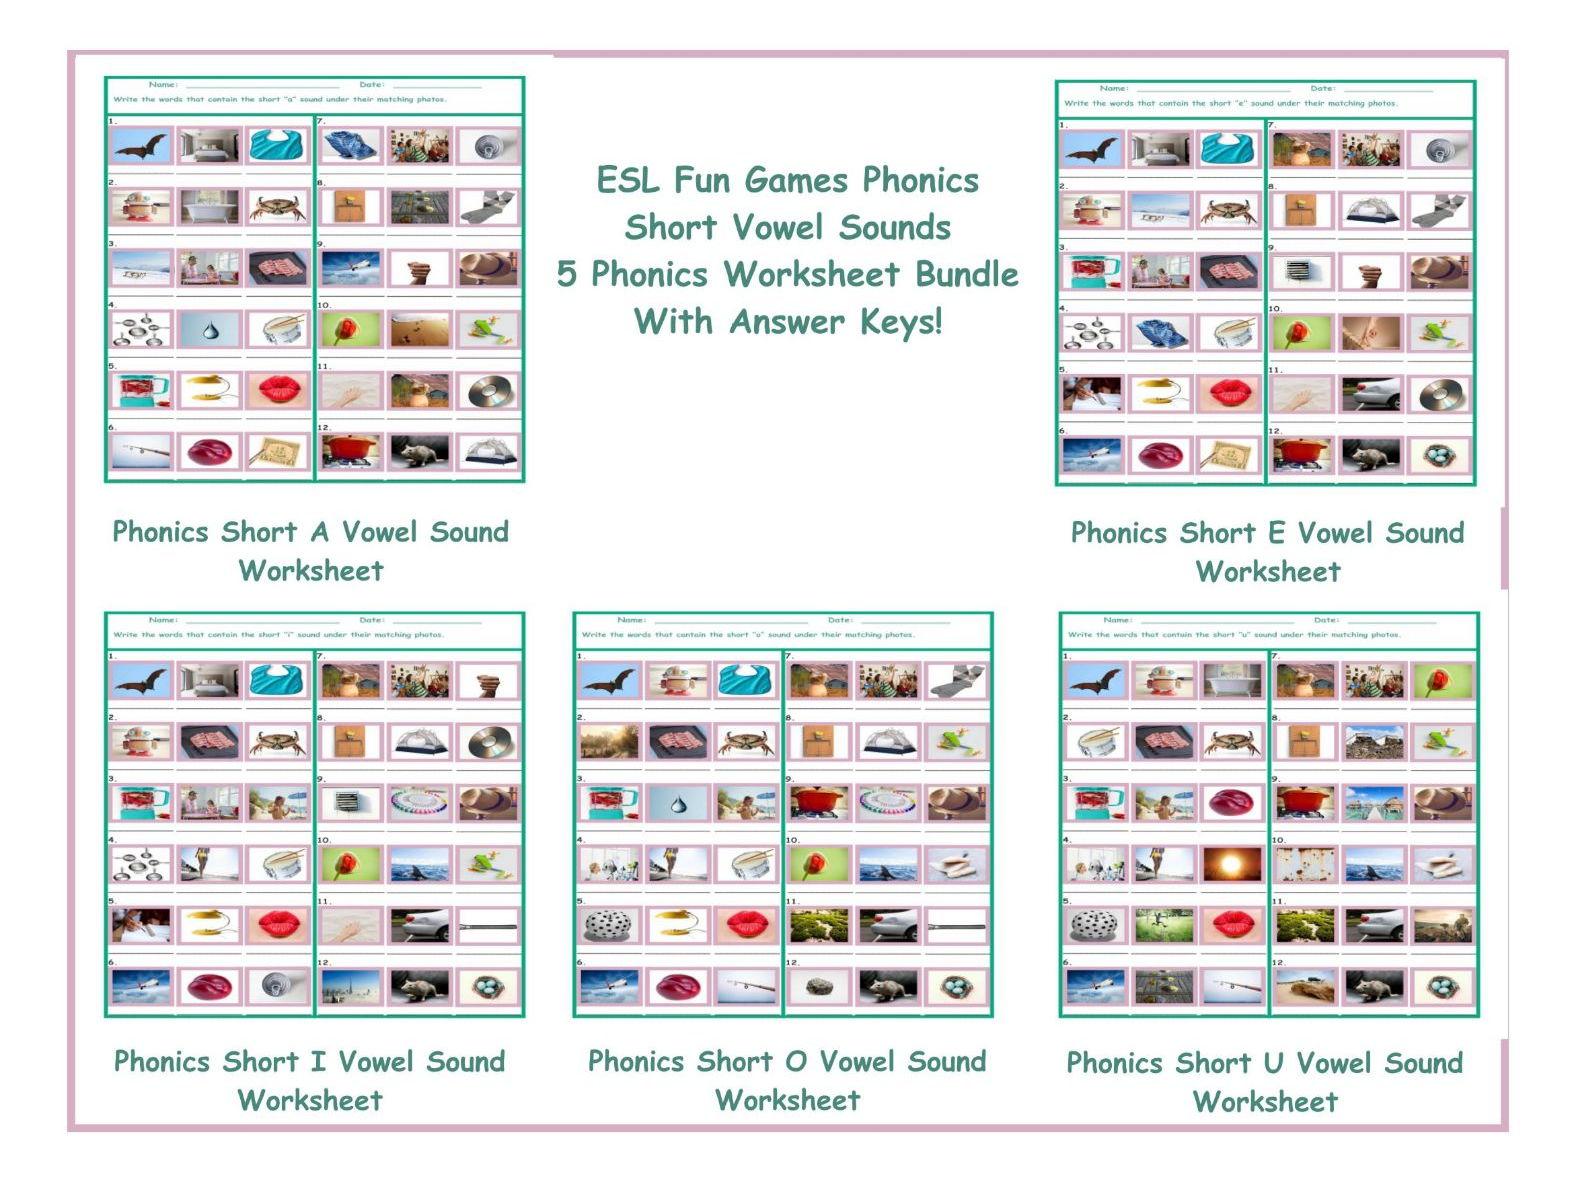 Phonics Short Vowel Sounds 5 Worksheet Bundle By Eslfungames